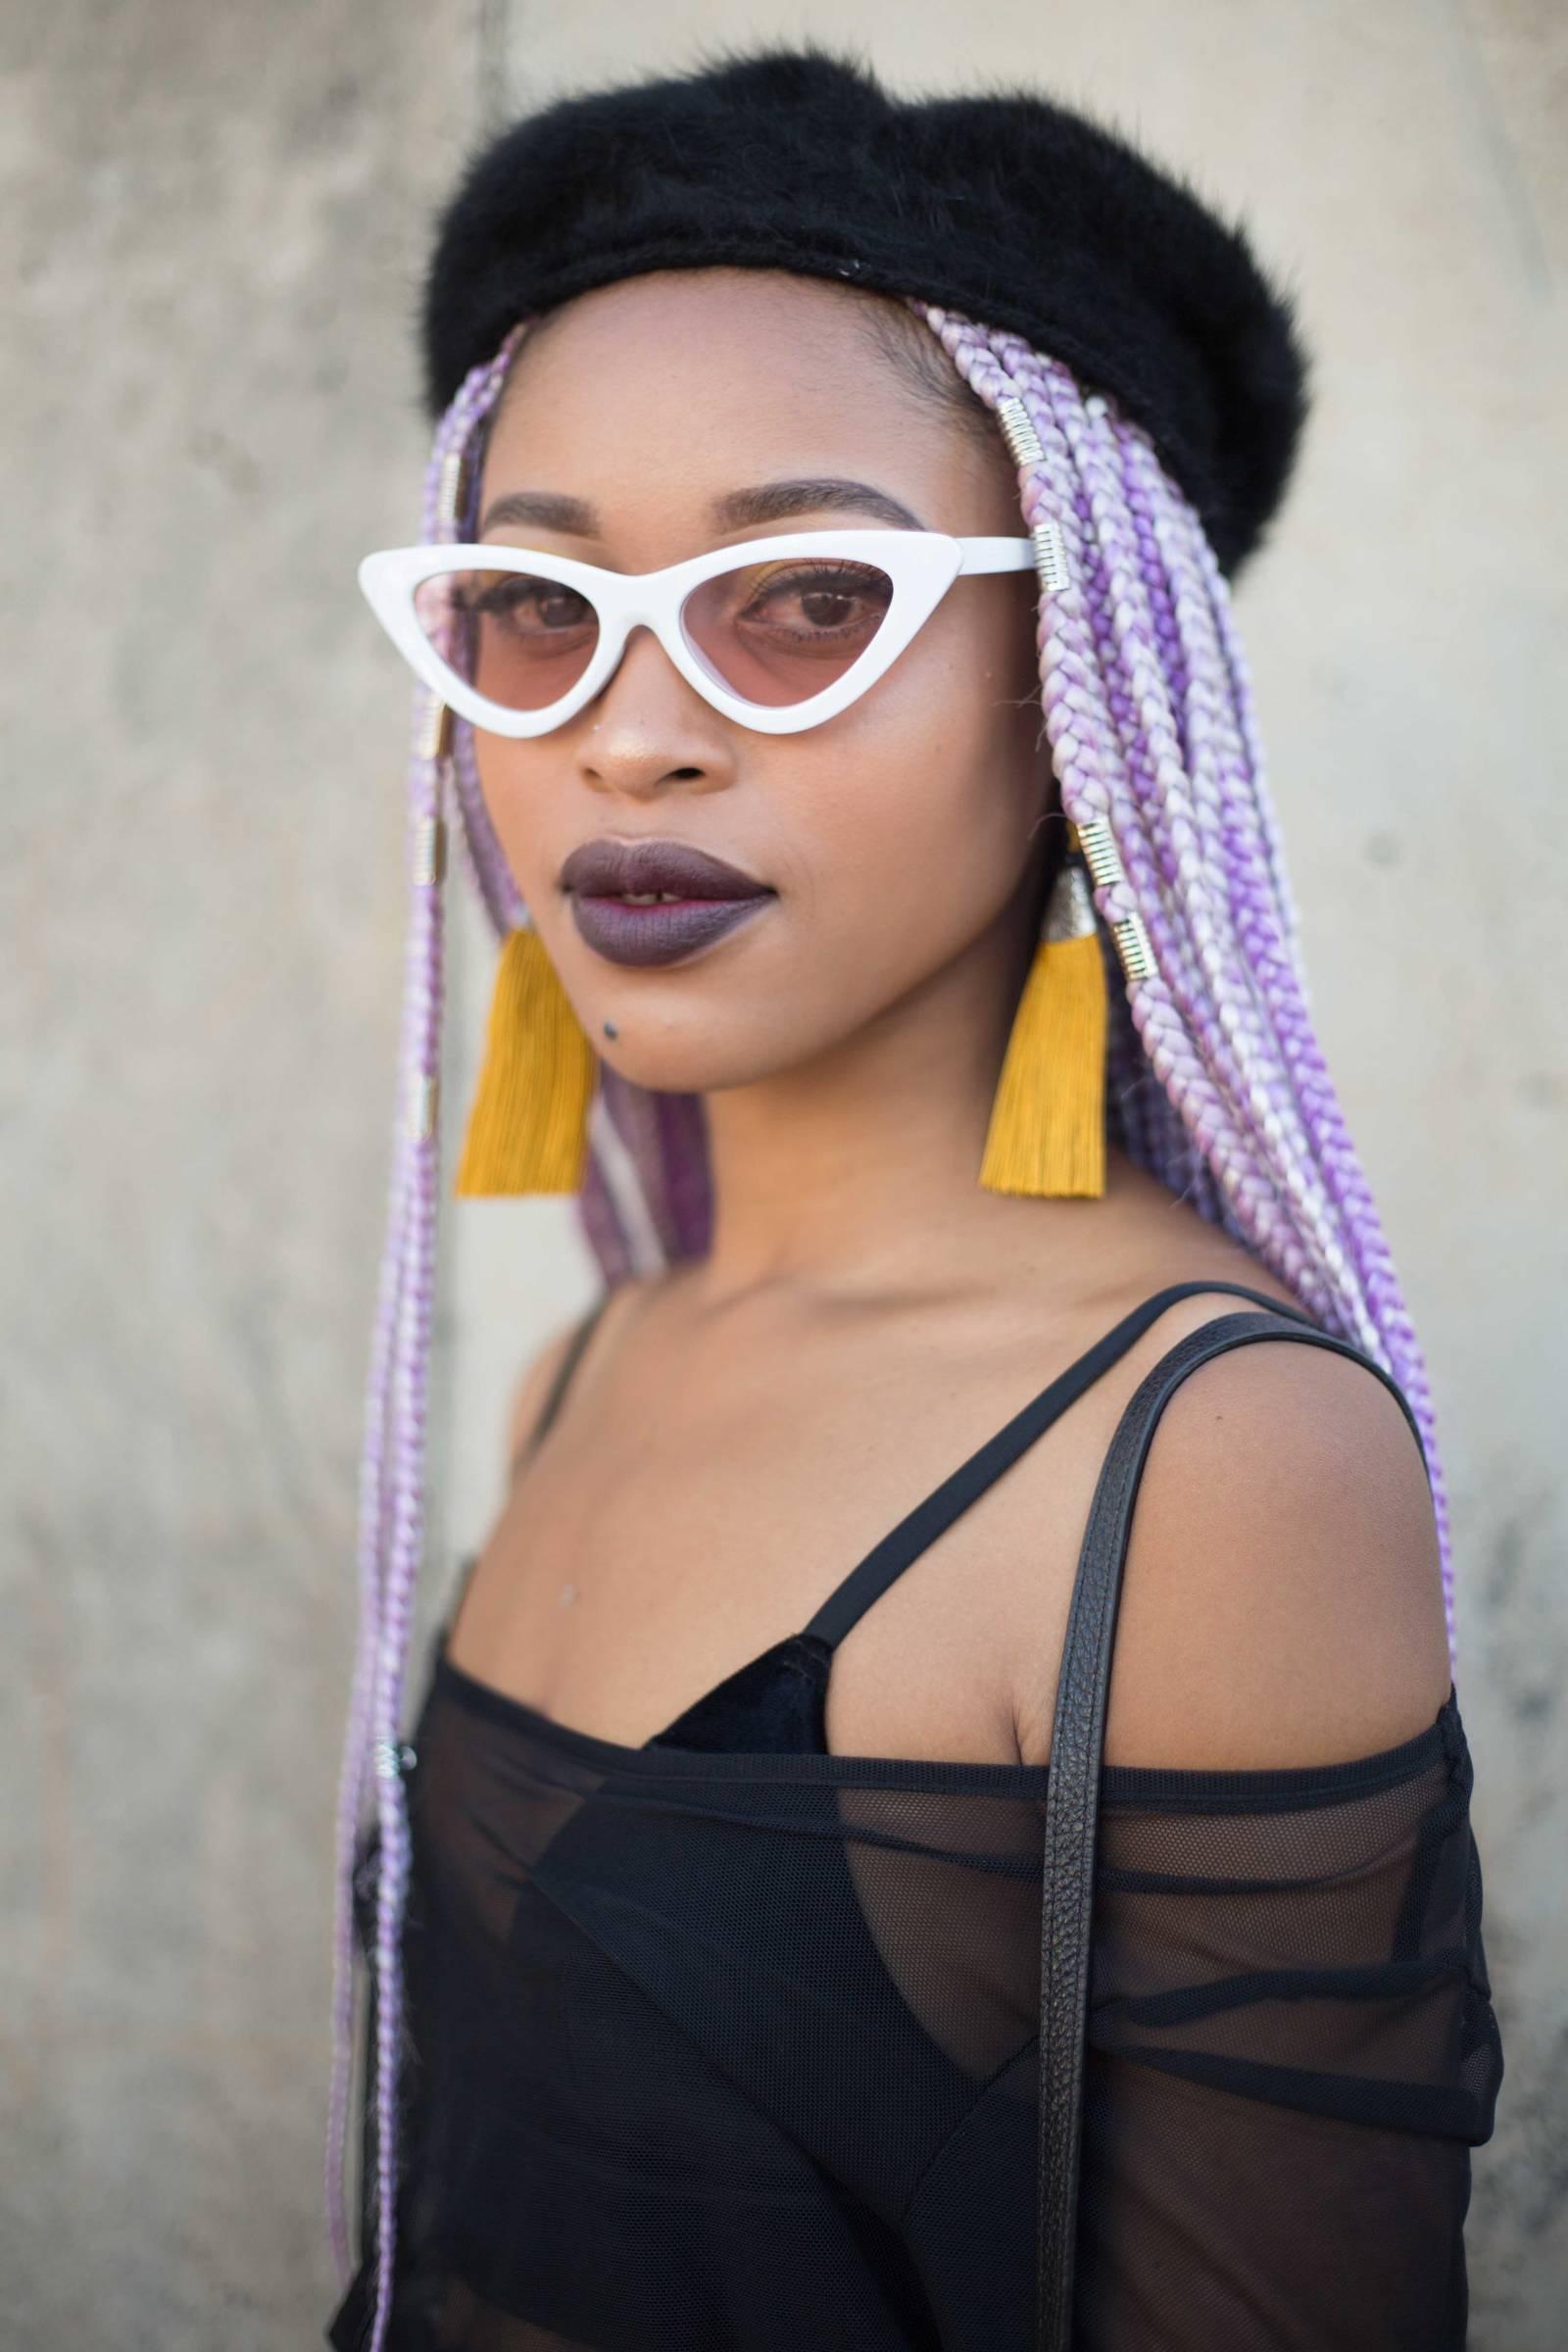 (c) Natasha Tendai / Essence.com